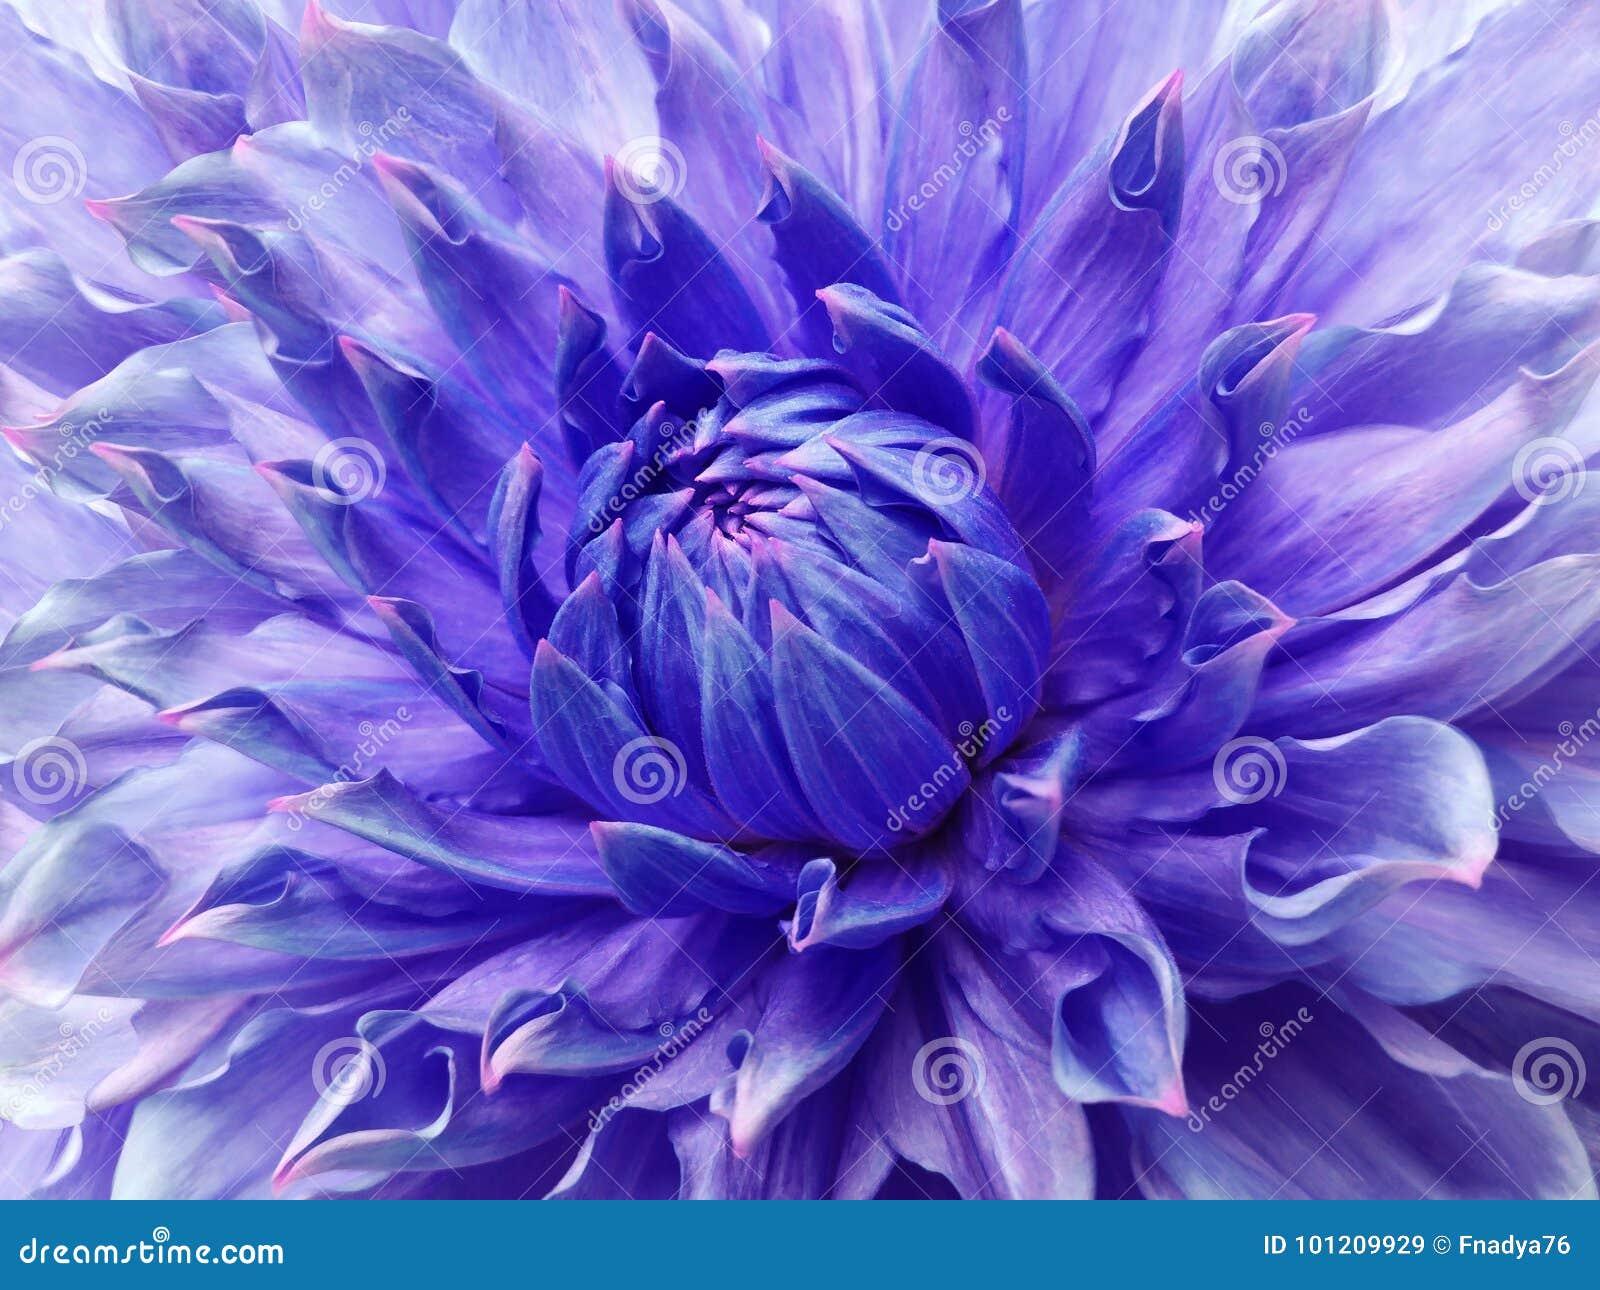 Dahlia Blue Violet Flower Macro Motley Big Flower Background From